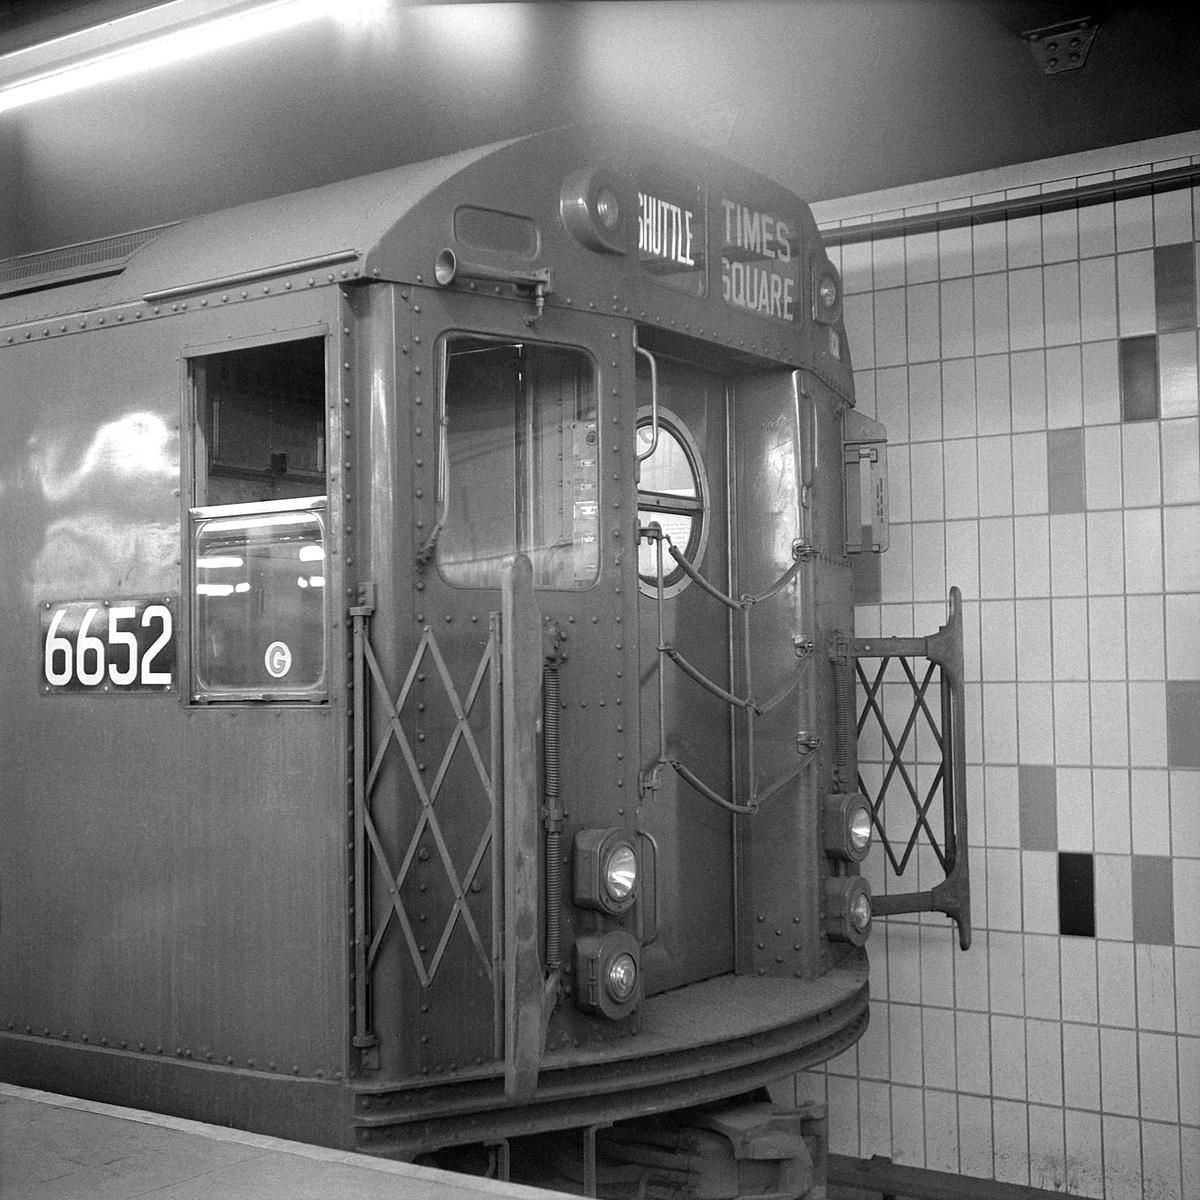 (575k, 1200x1200)<br><b>Country:</b> United States<br><b>City:</b> New York<br><b>System:</b> New York City Transit<br><b>Line:</b> IRT Times Square-Grand Central Shuttle<br><b>Location:</b> Grand Central<br><b>Route:</b> S<br><b>Car:</b> R-17 (St. Louis, 1955-56) 6652 <br><b>Collection of:</b> David Pirmann<br><b>Date:</b> 4/6/1968<br><b>Viewed (this week/total):</b> 1 / 376